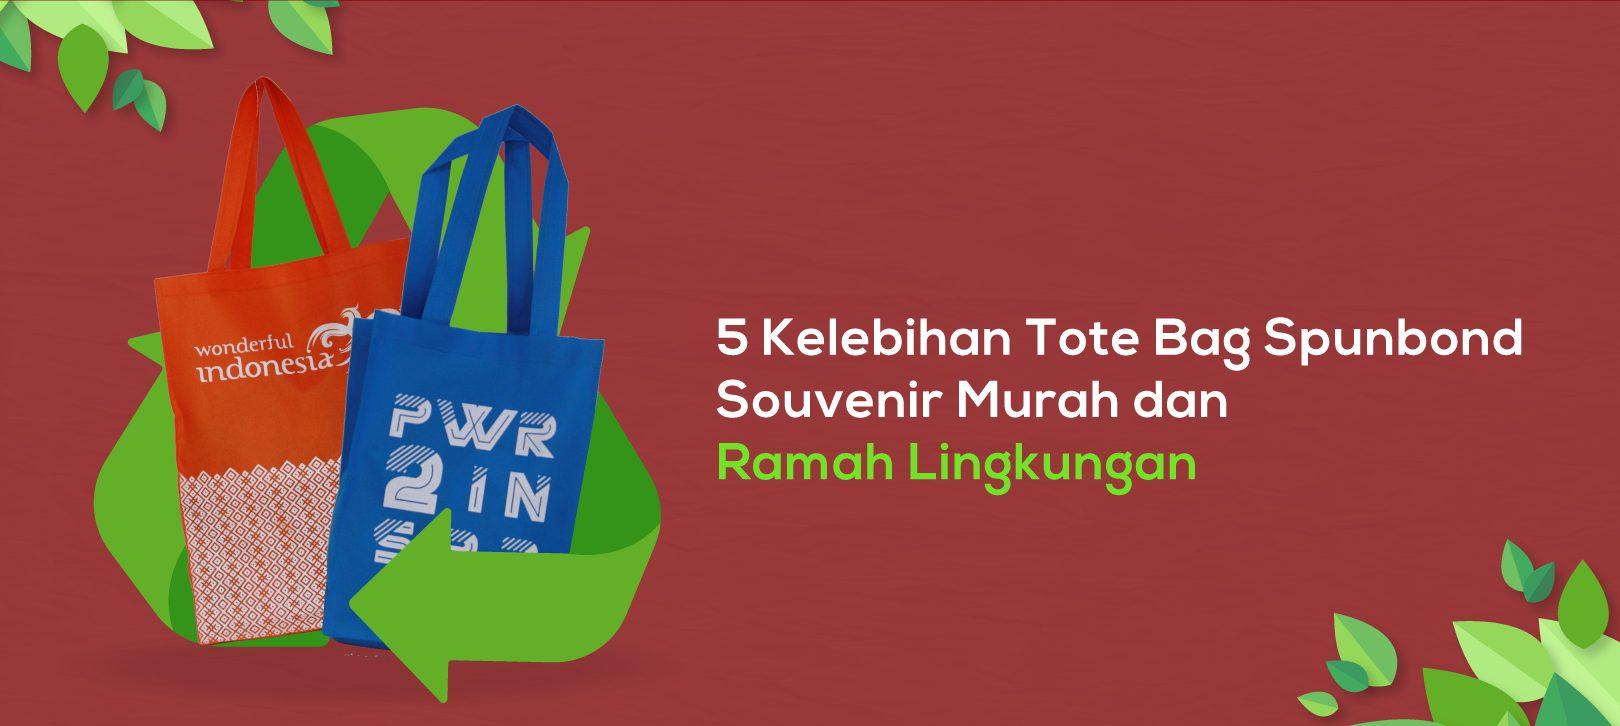 5 Kelebihan Tote Bag Spunbond, Souvenir Murah dan Ramah Lingkungan